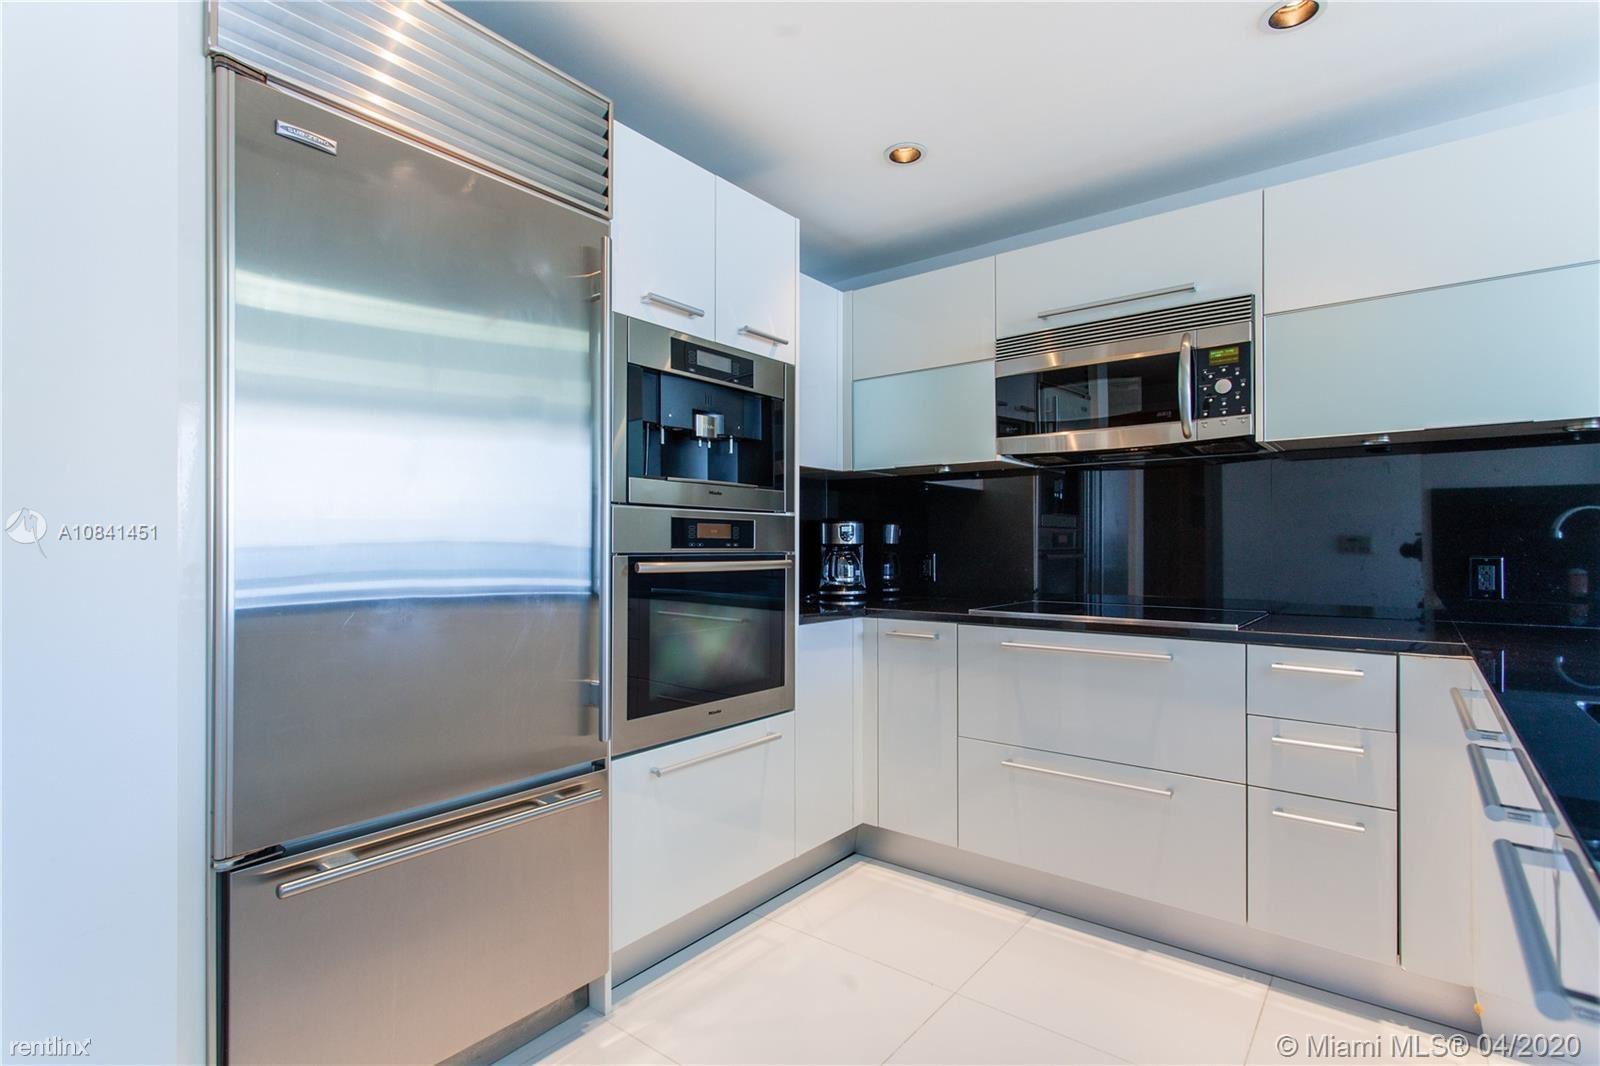 17121 Collins Ave, Sunny Isles Beach, FL - $4,500